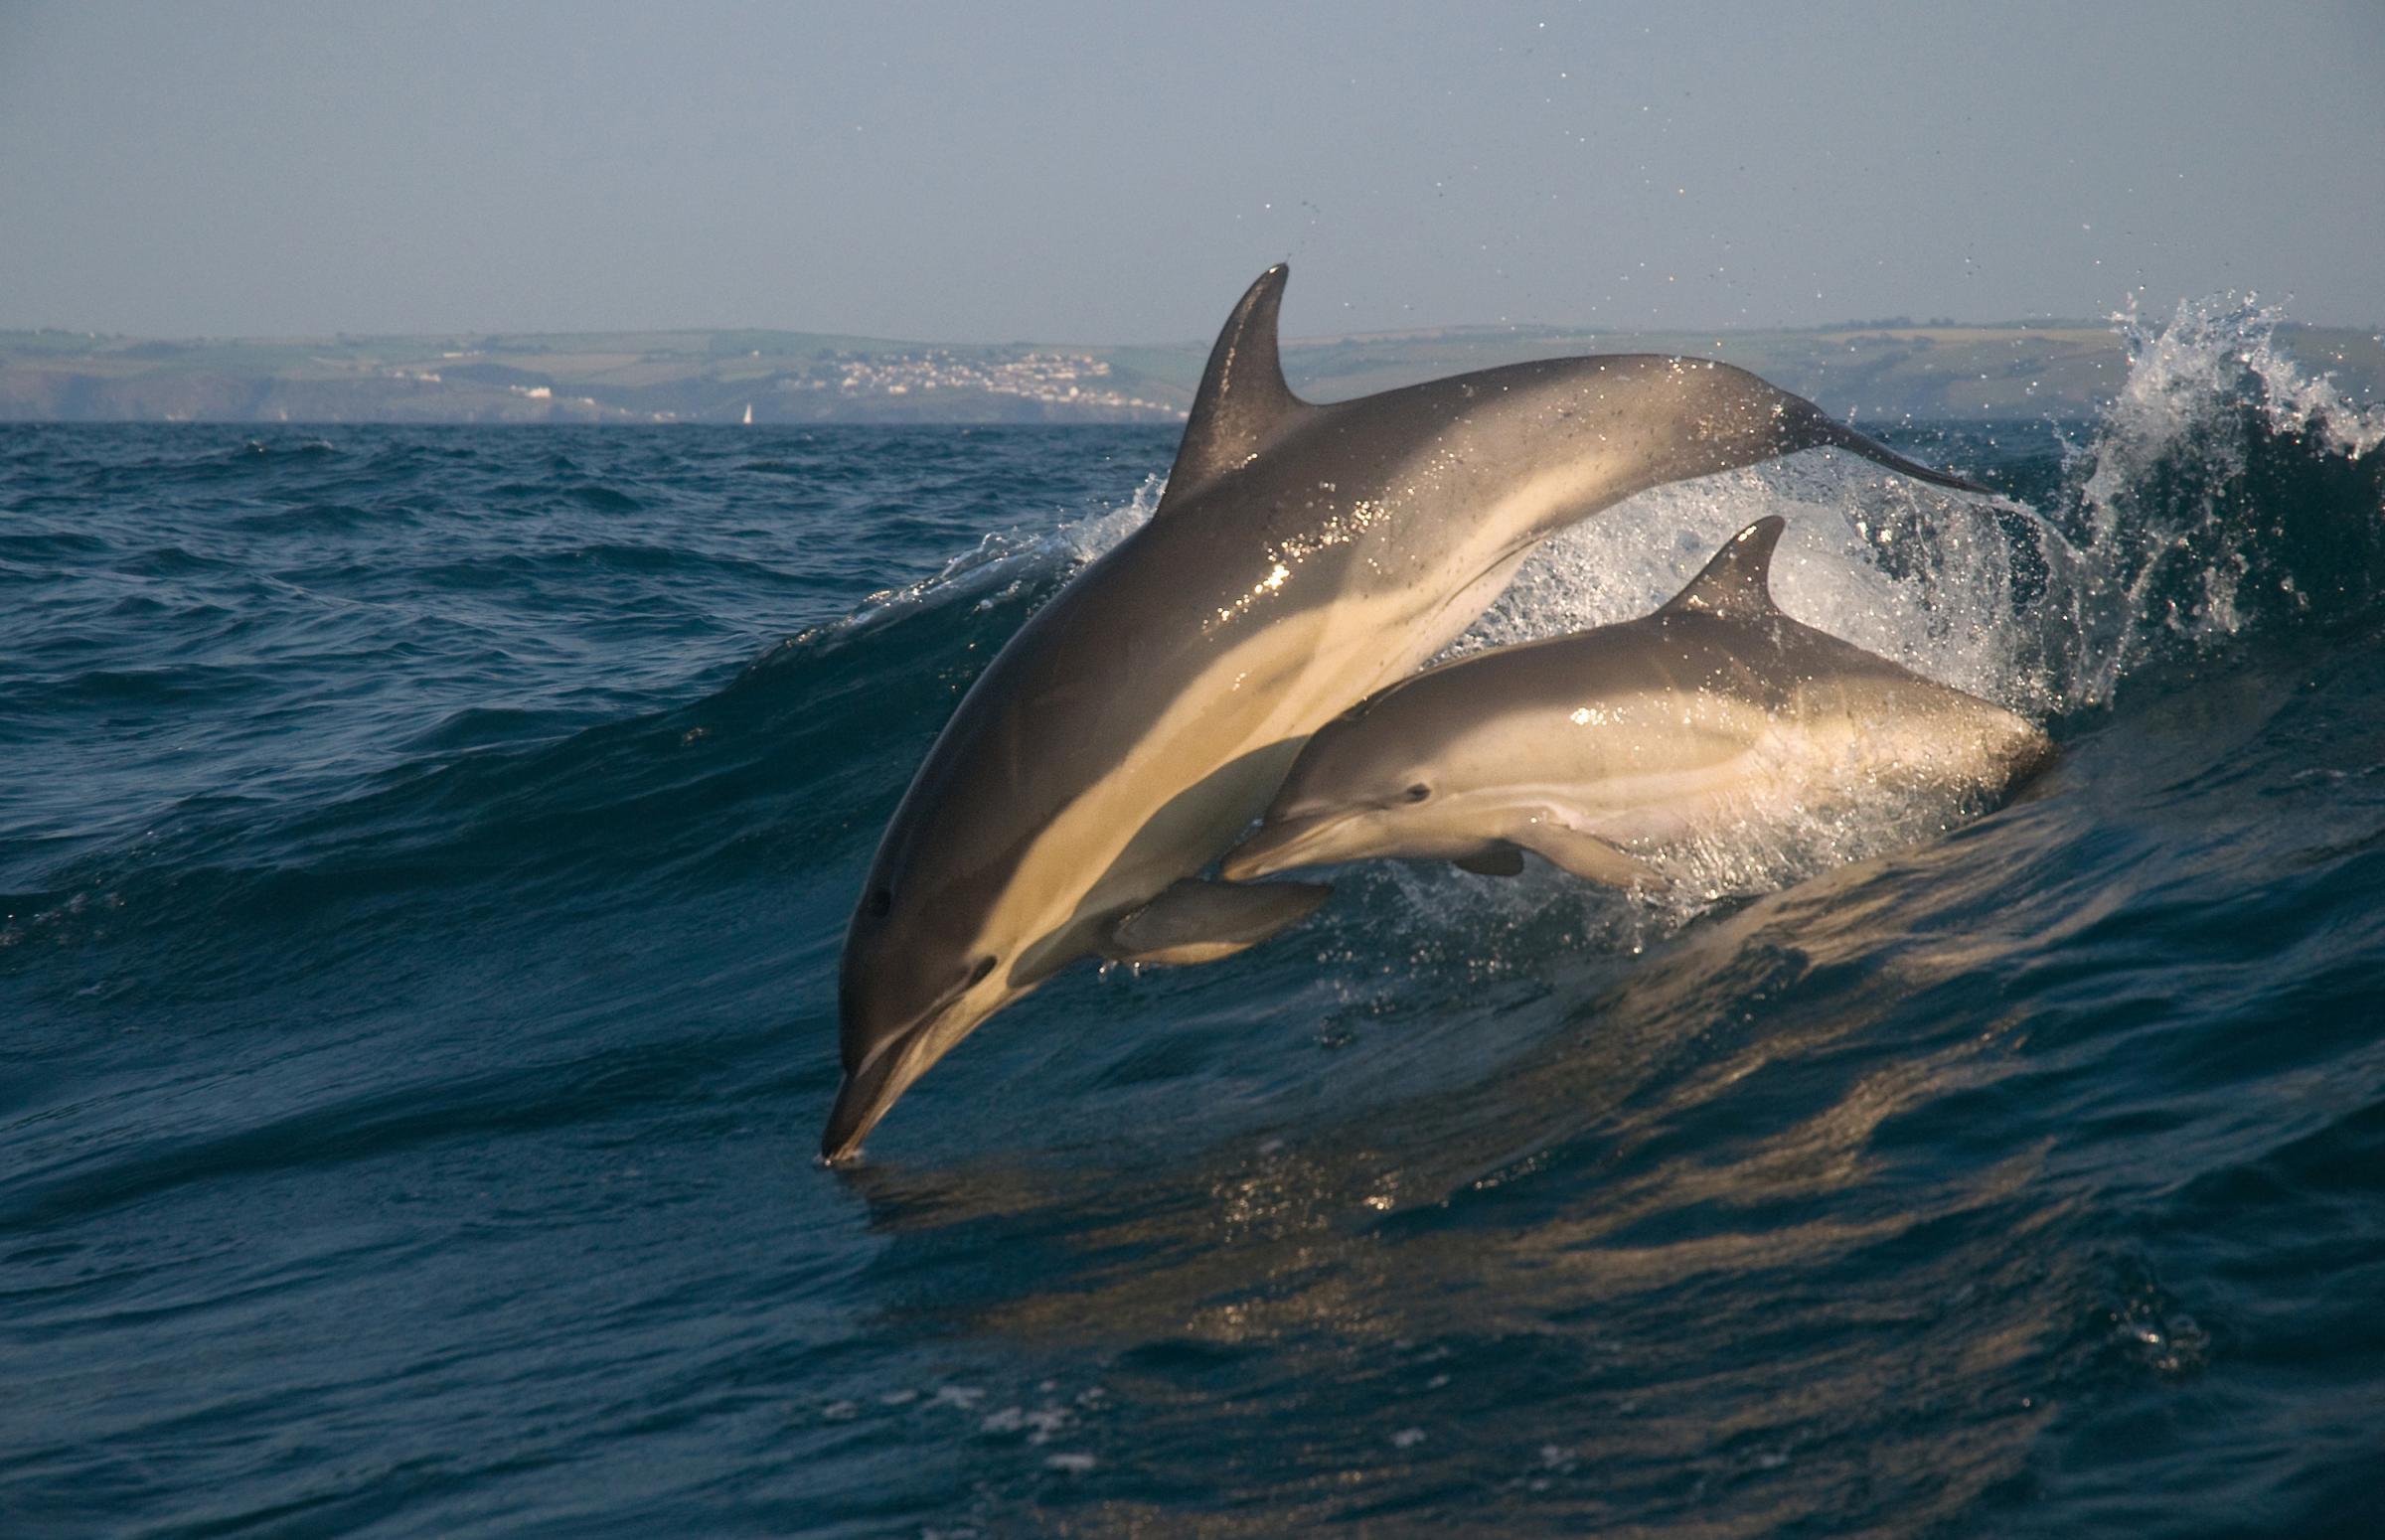 Frugi donates £13,000 to Cornwall Wildlife Trust